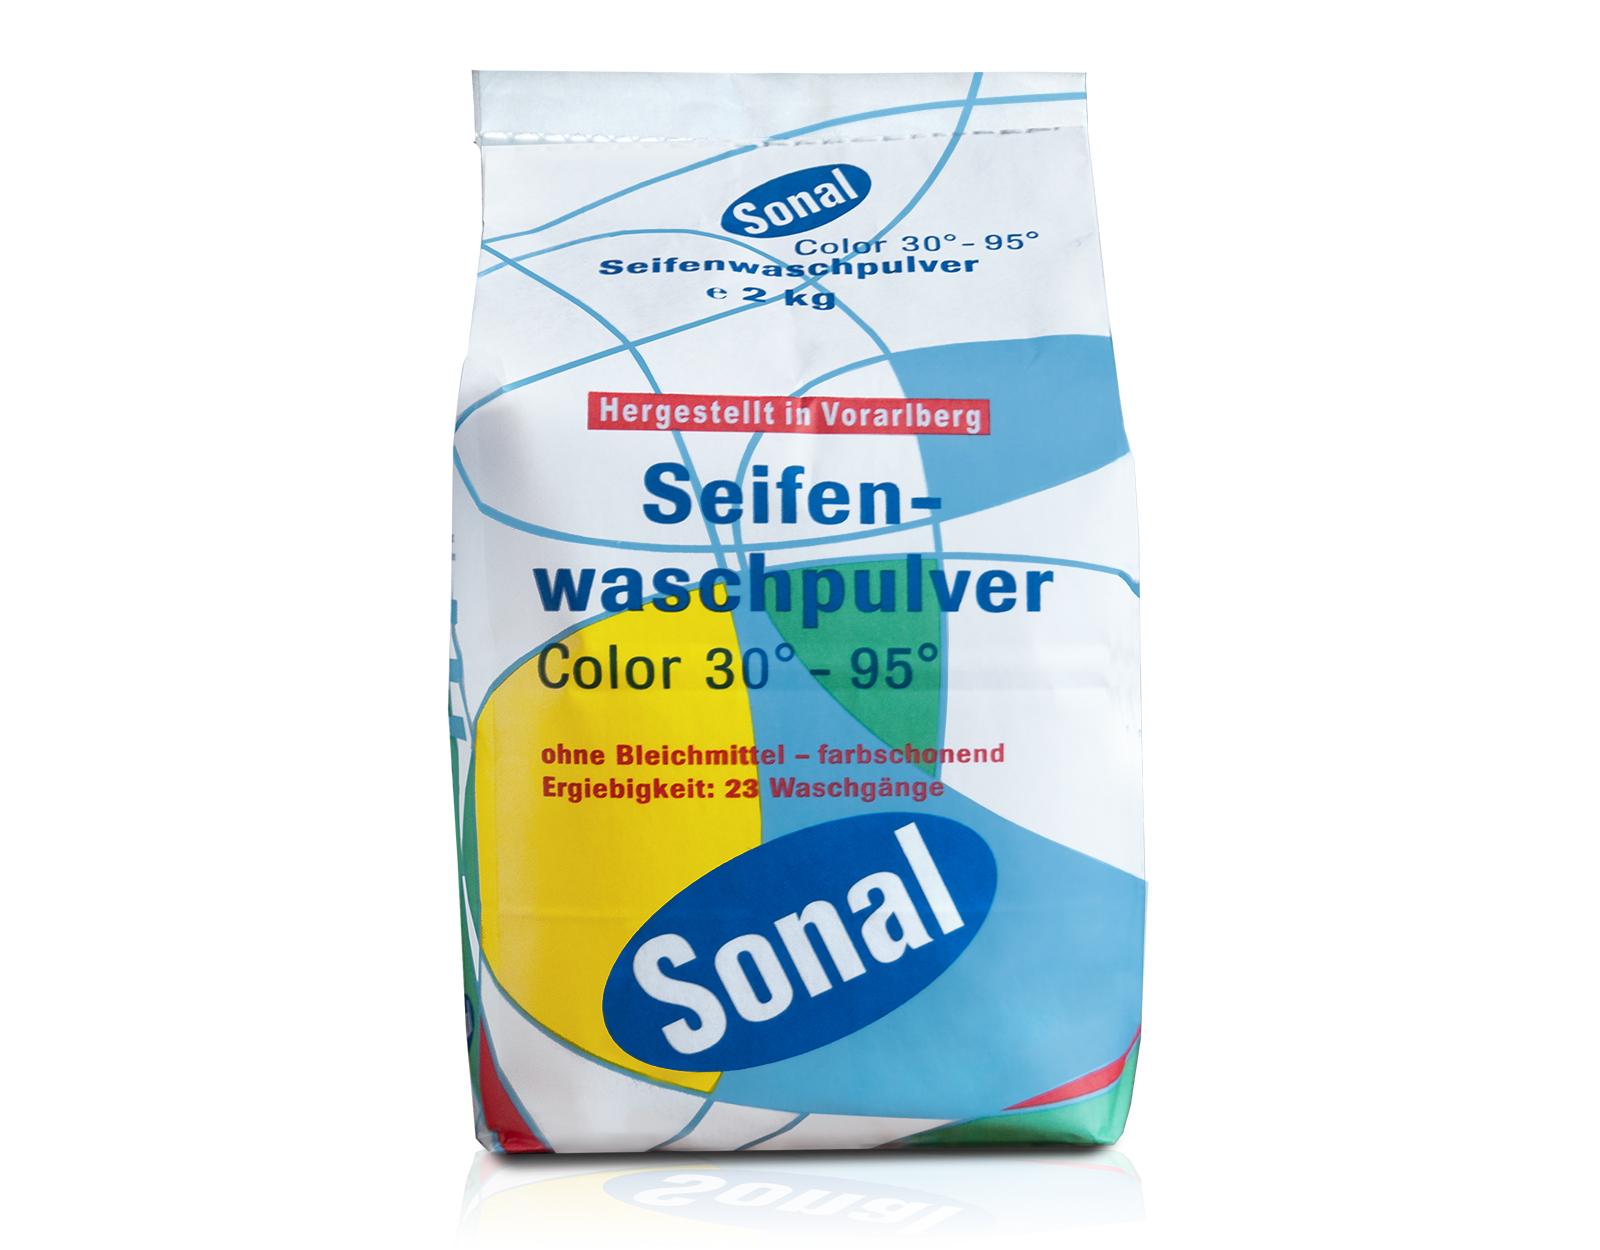 Seifenwaschpulver Color 30°-95°, 2 kg | Sonal